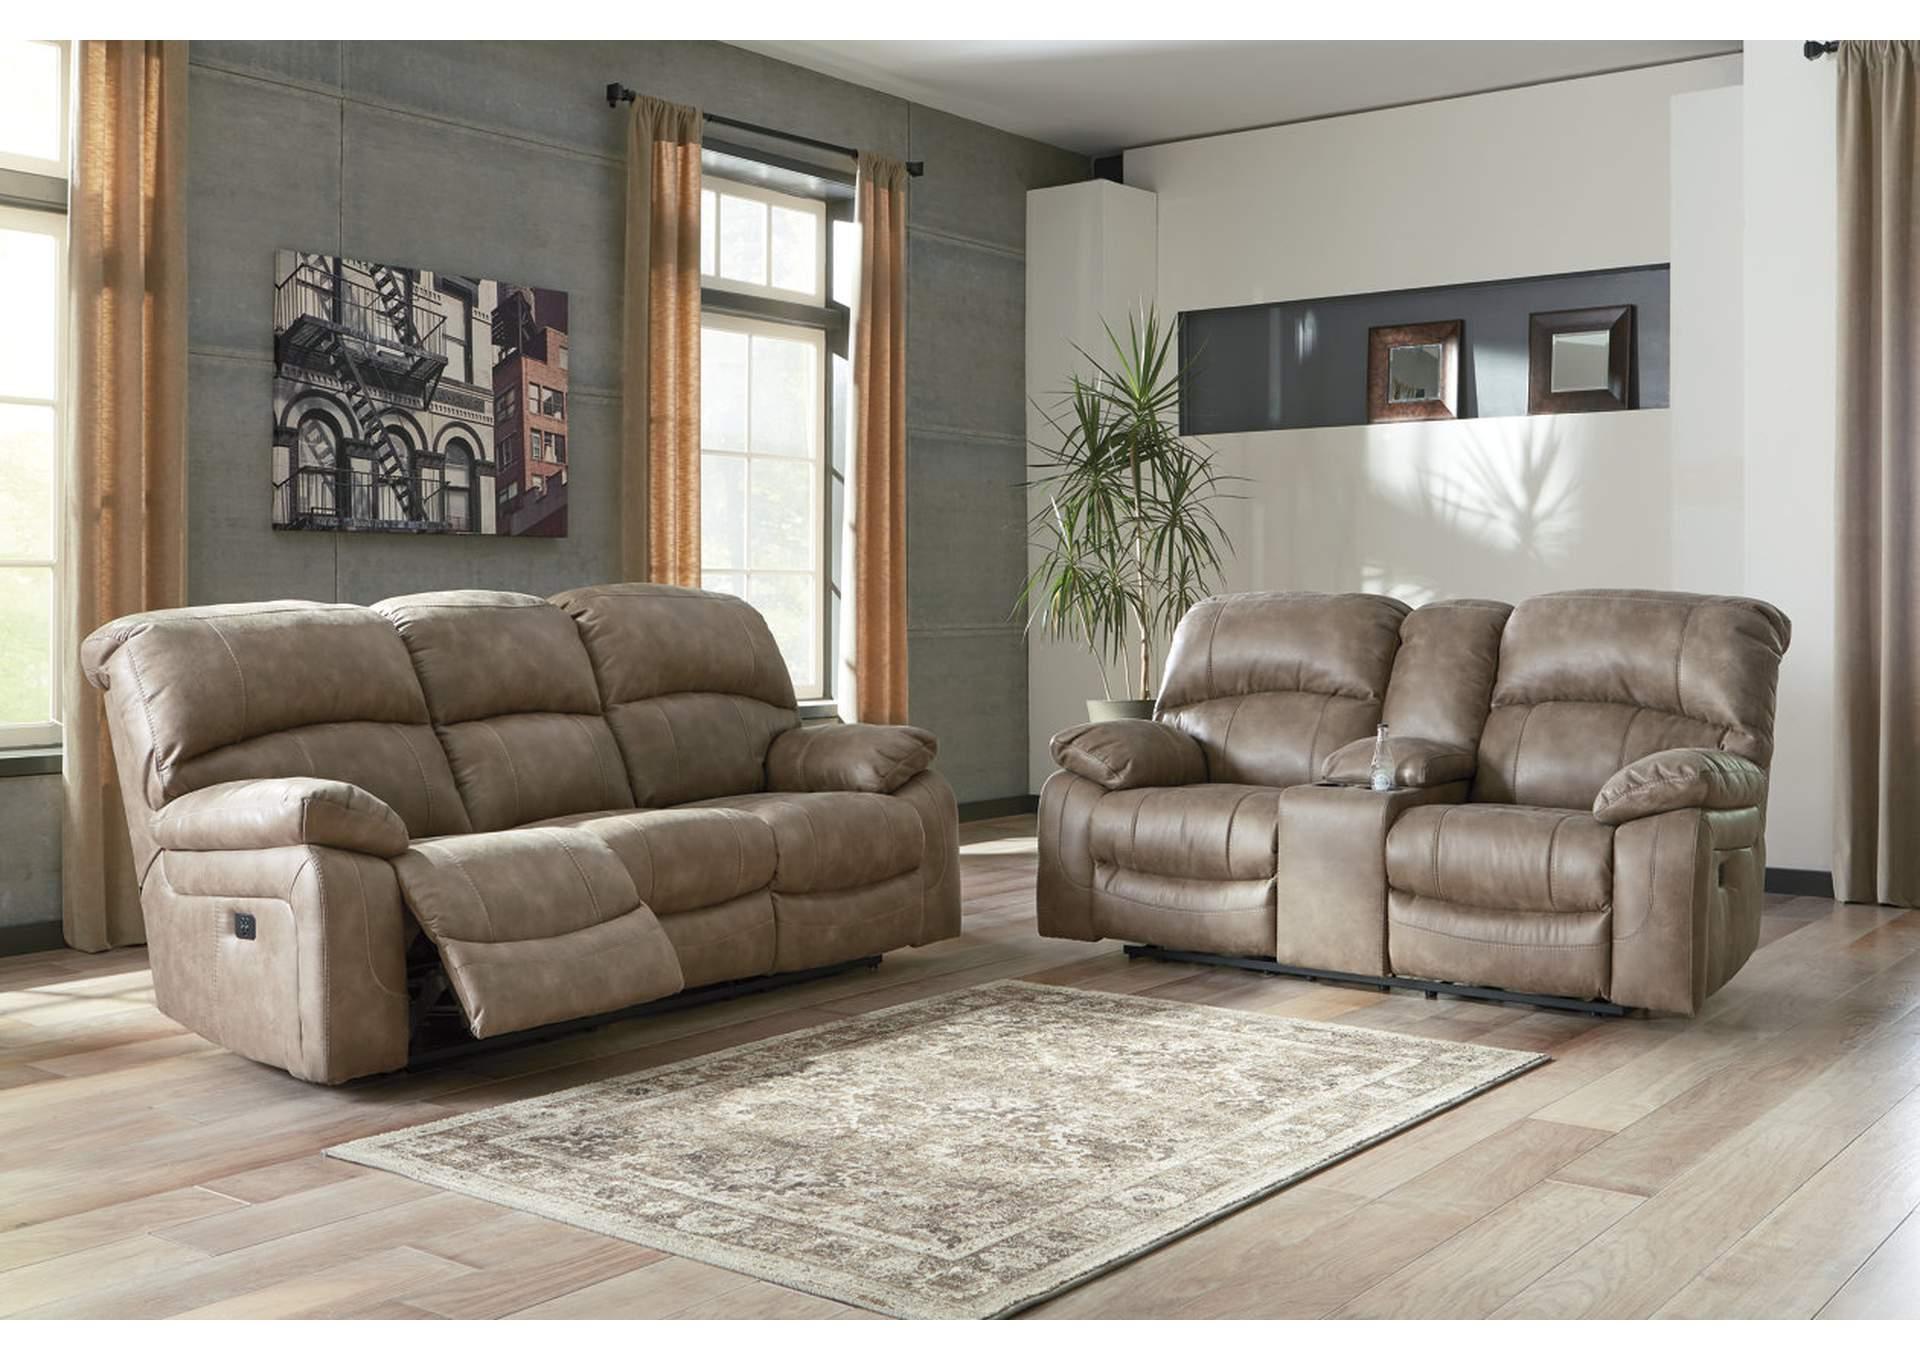 Southside Furniture Dunwell Driftwood Power Reclining Sofa